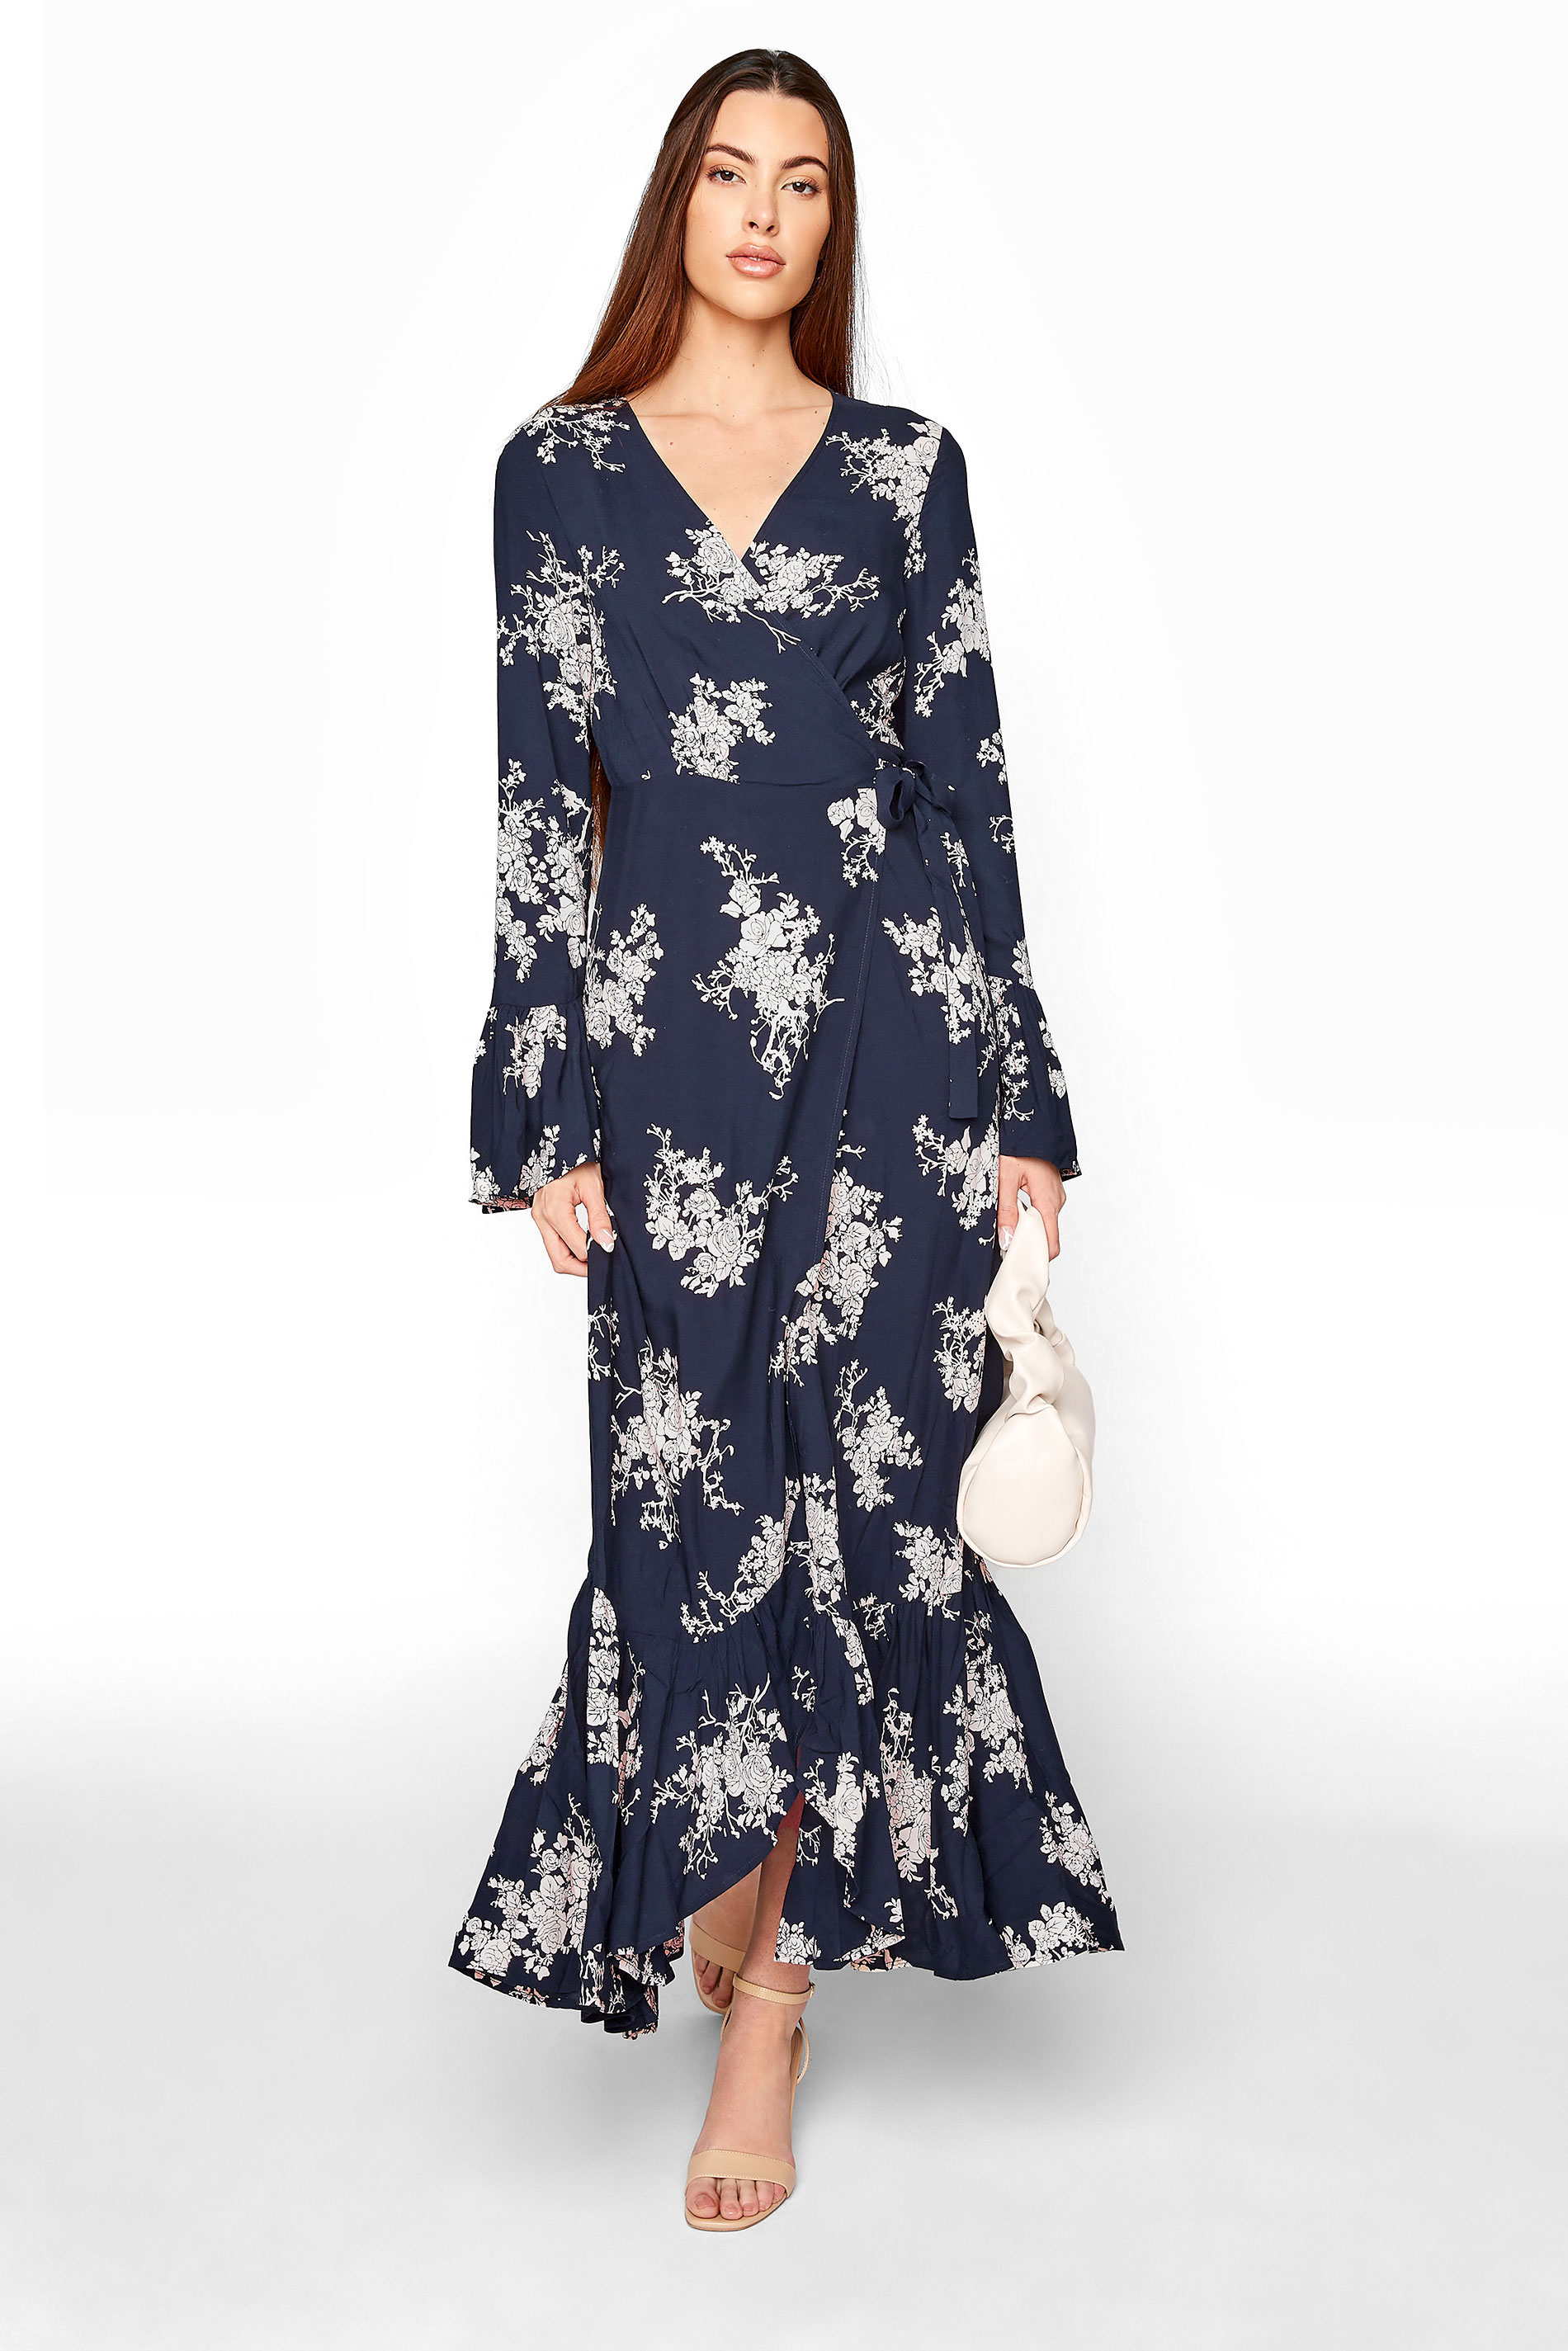 LTS Navy Floral Wrap Dress